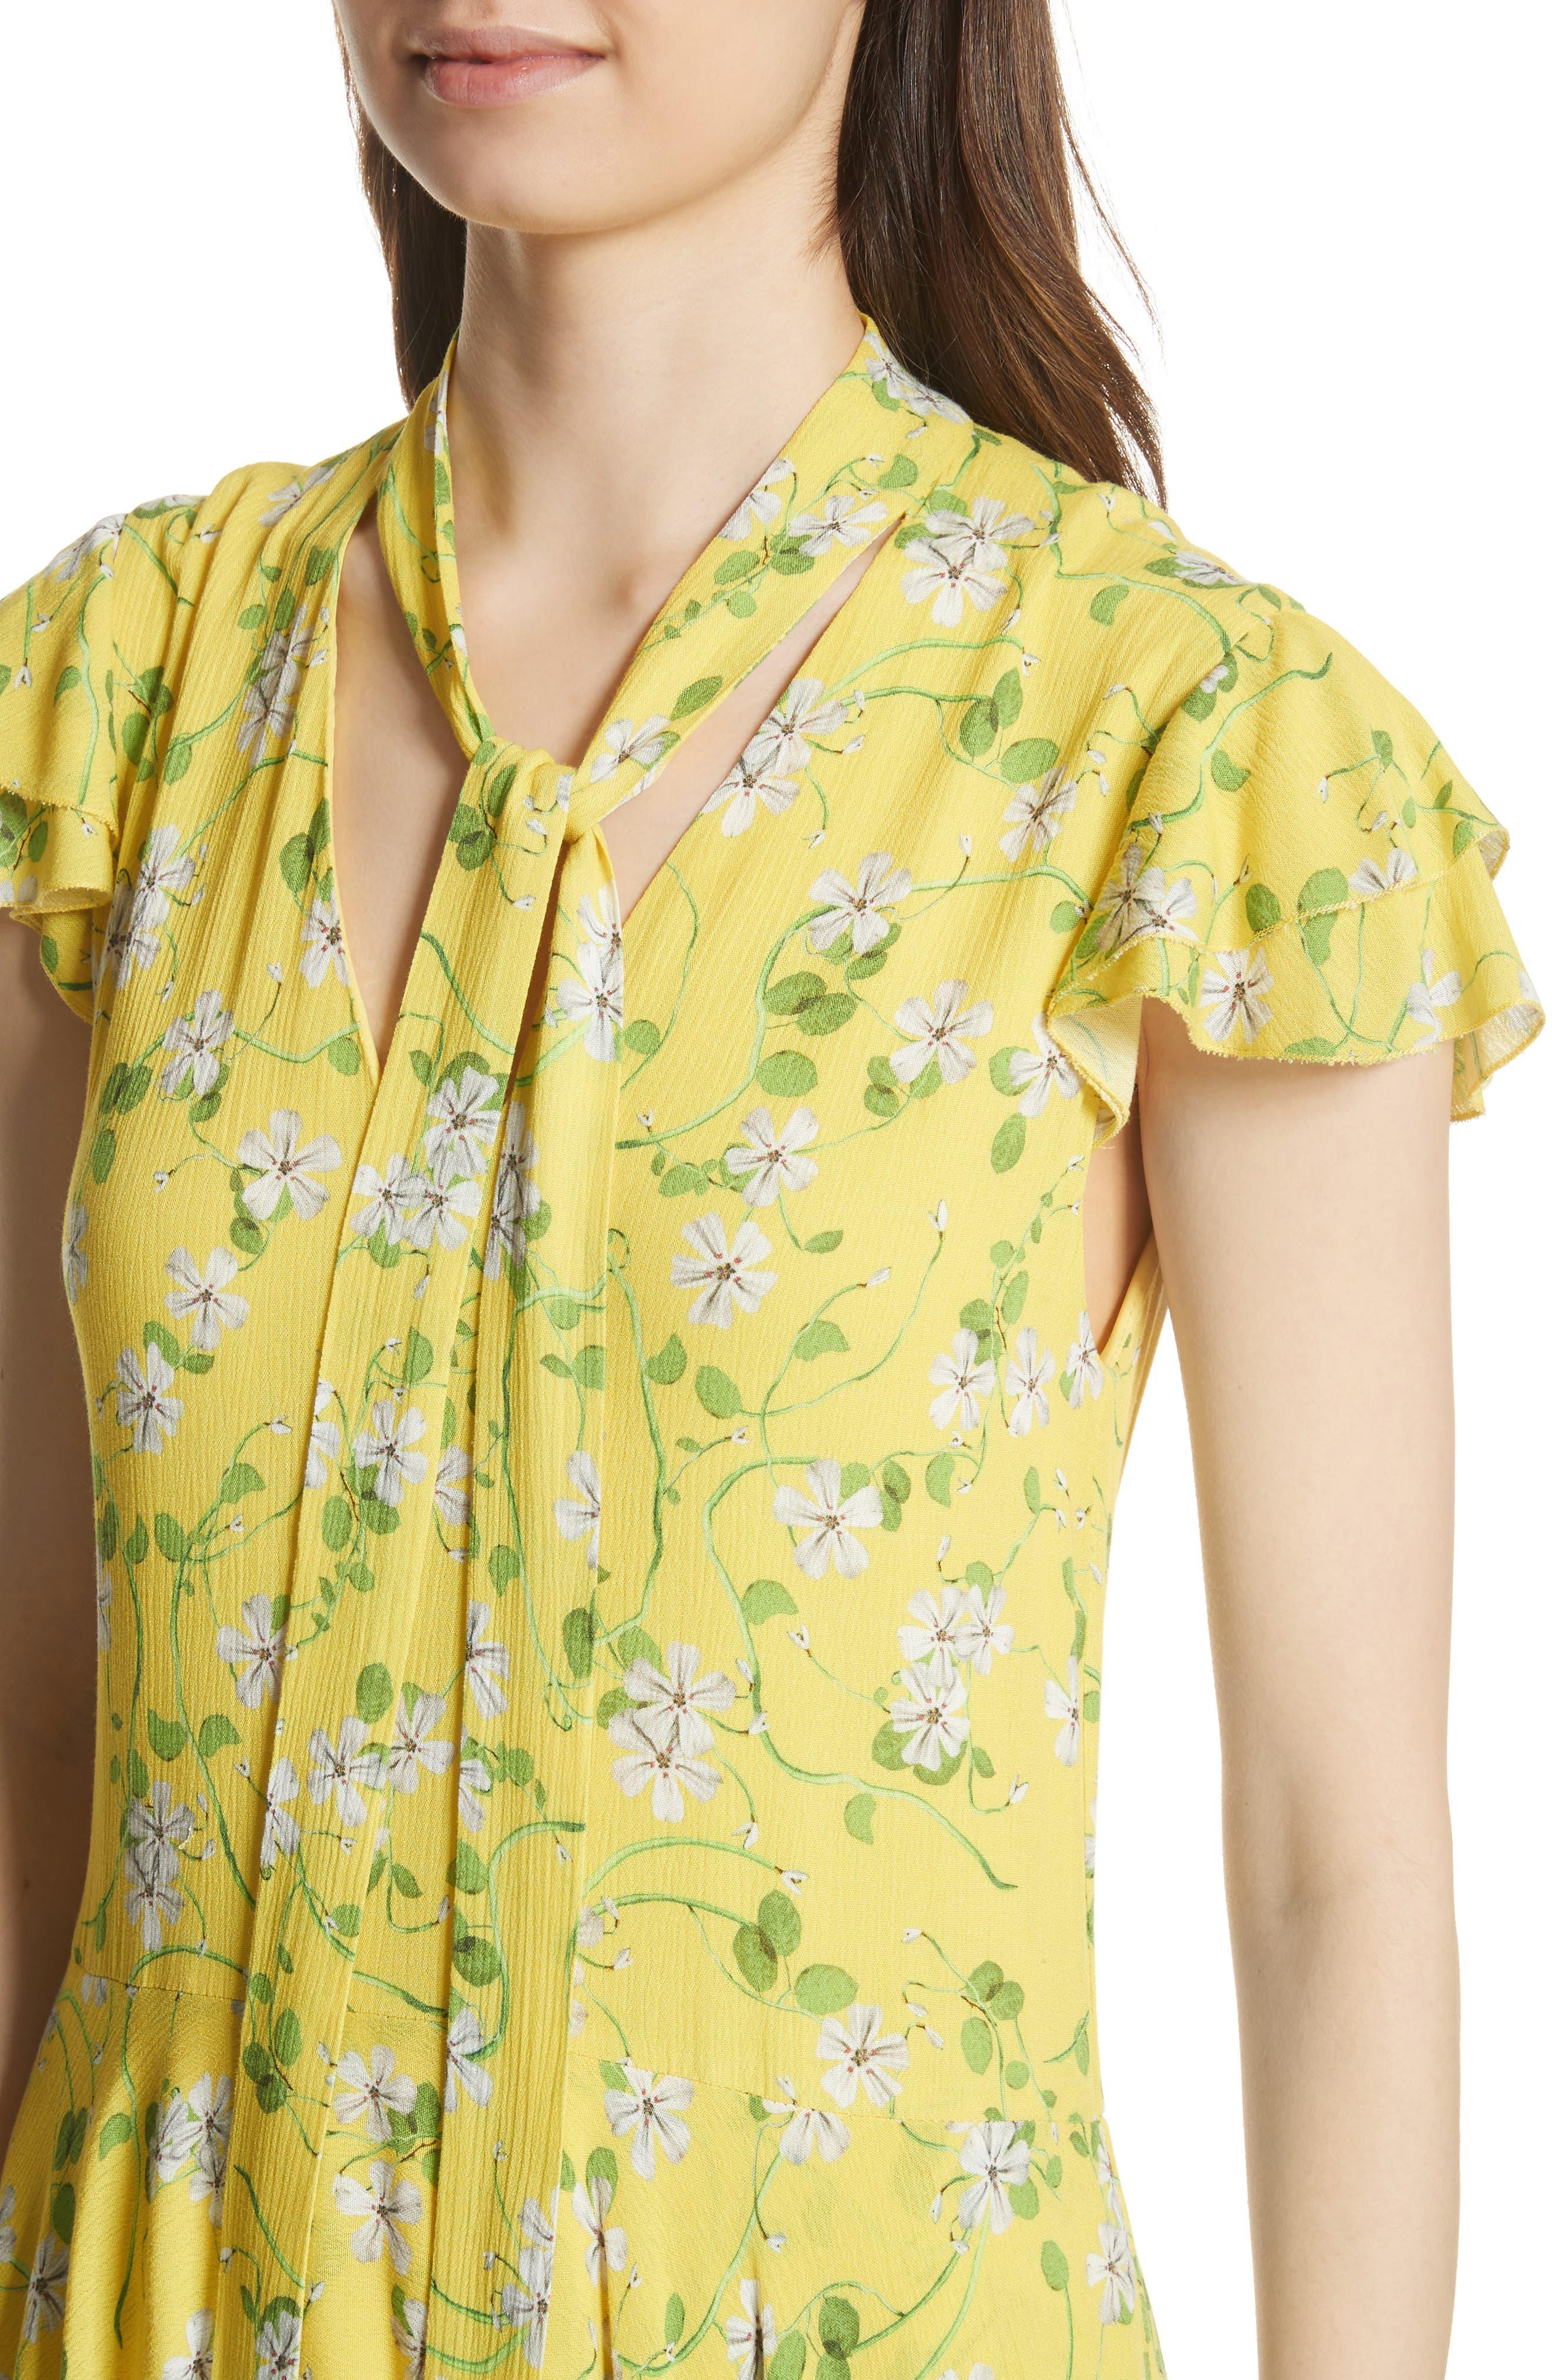 Moore Flutter Sleeve Layered Tunic Dress,                             Alternate thumbnail 4, color,                             Spring Primrose-Lemon